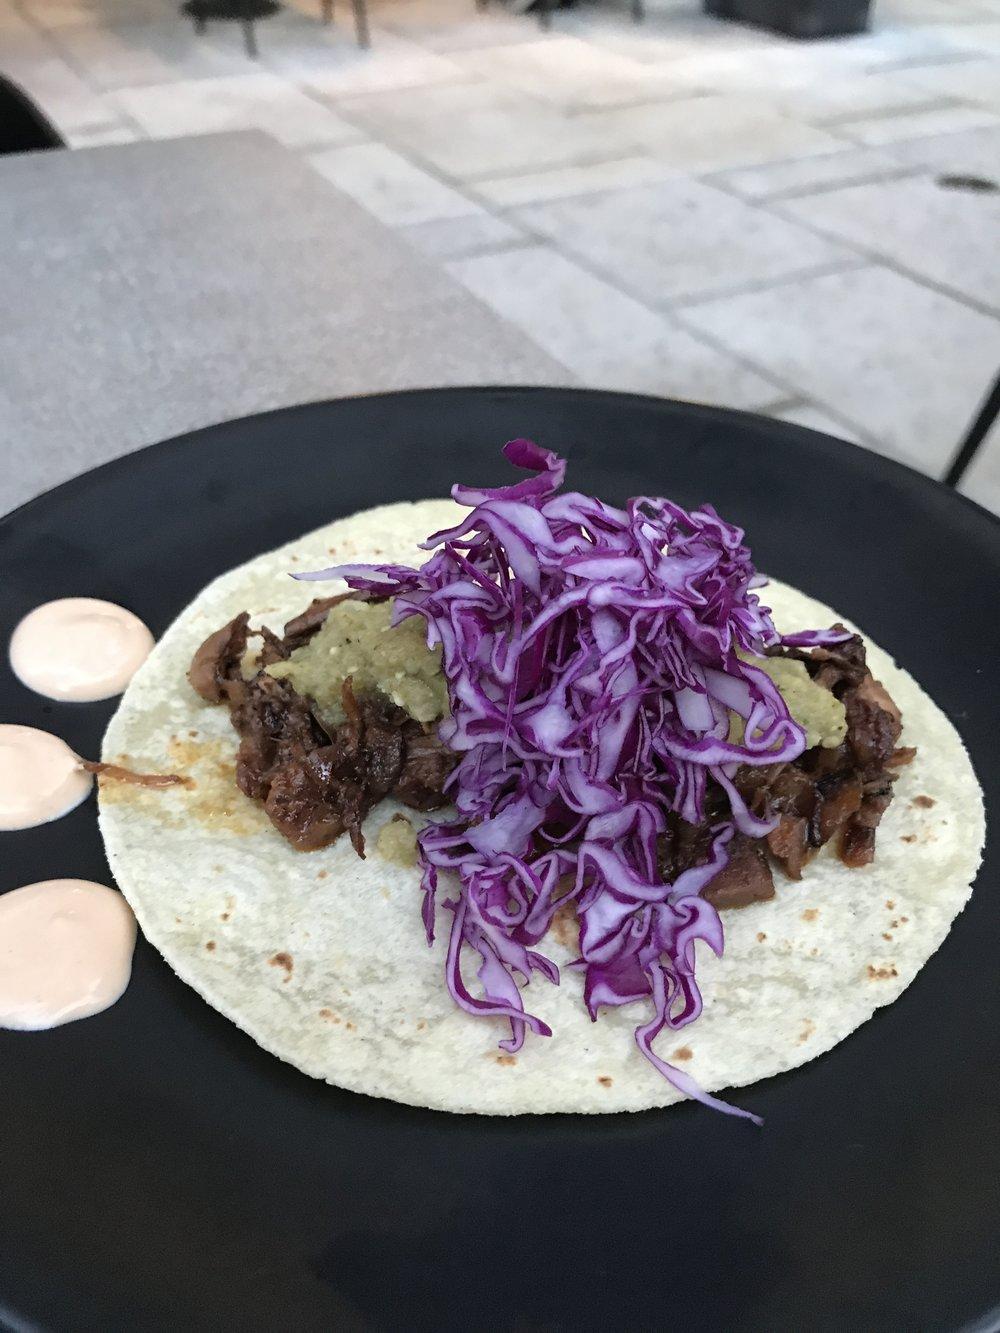 GLAM Vegan Miami jackfruit al pastor taco